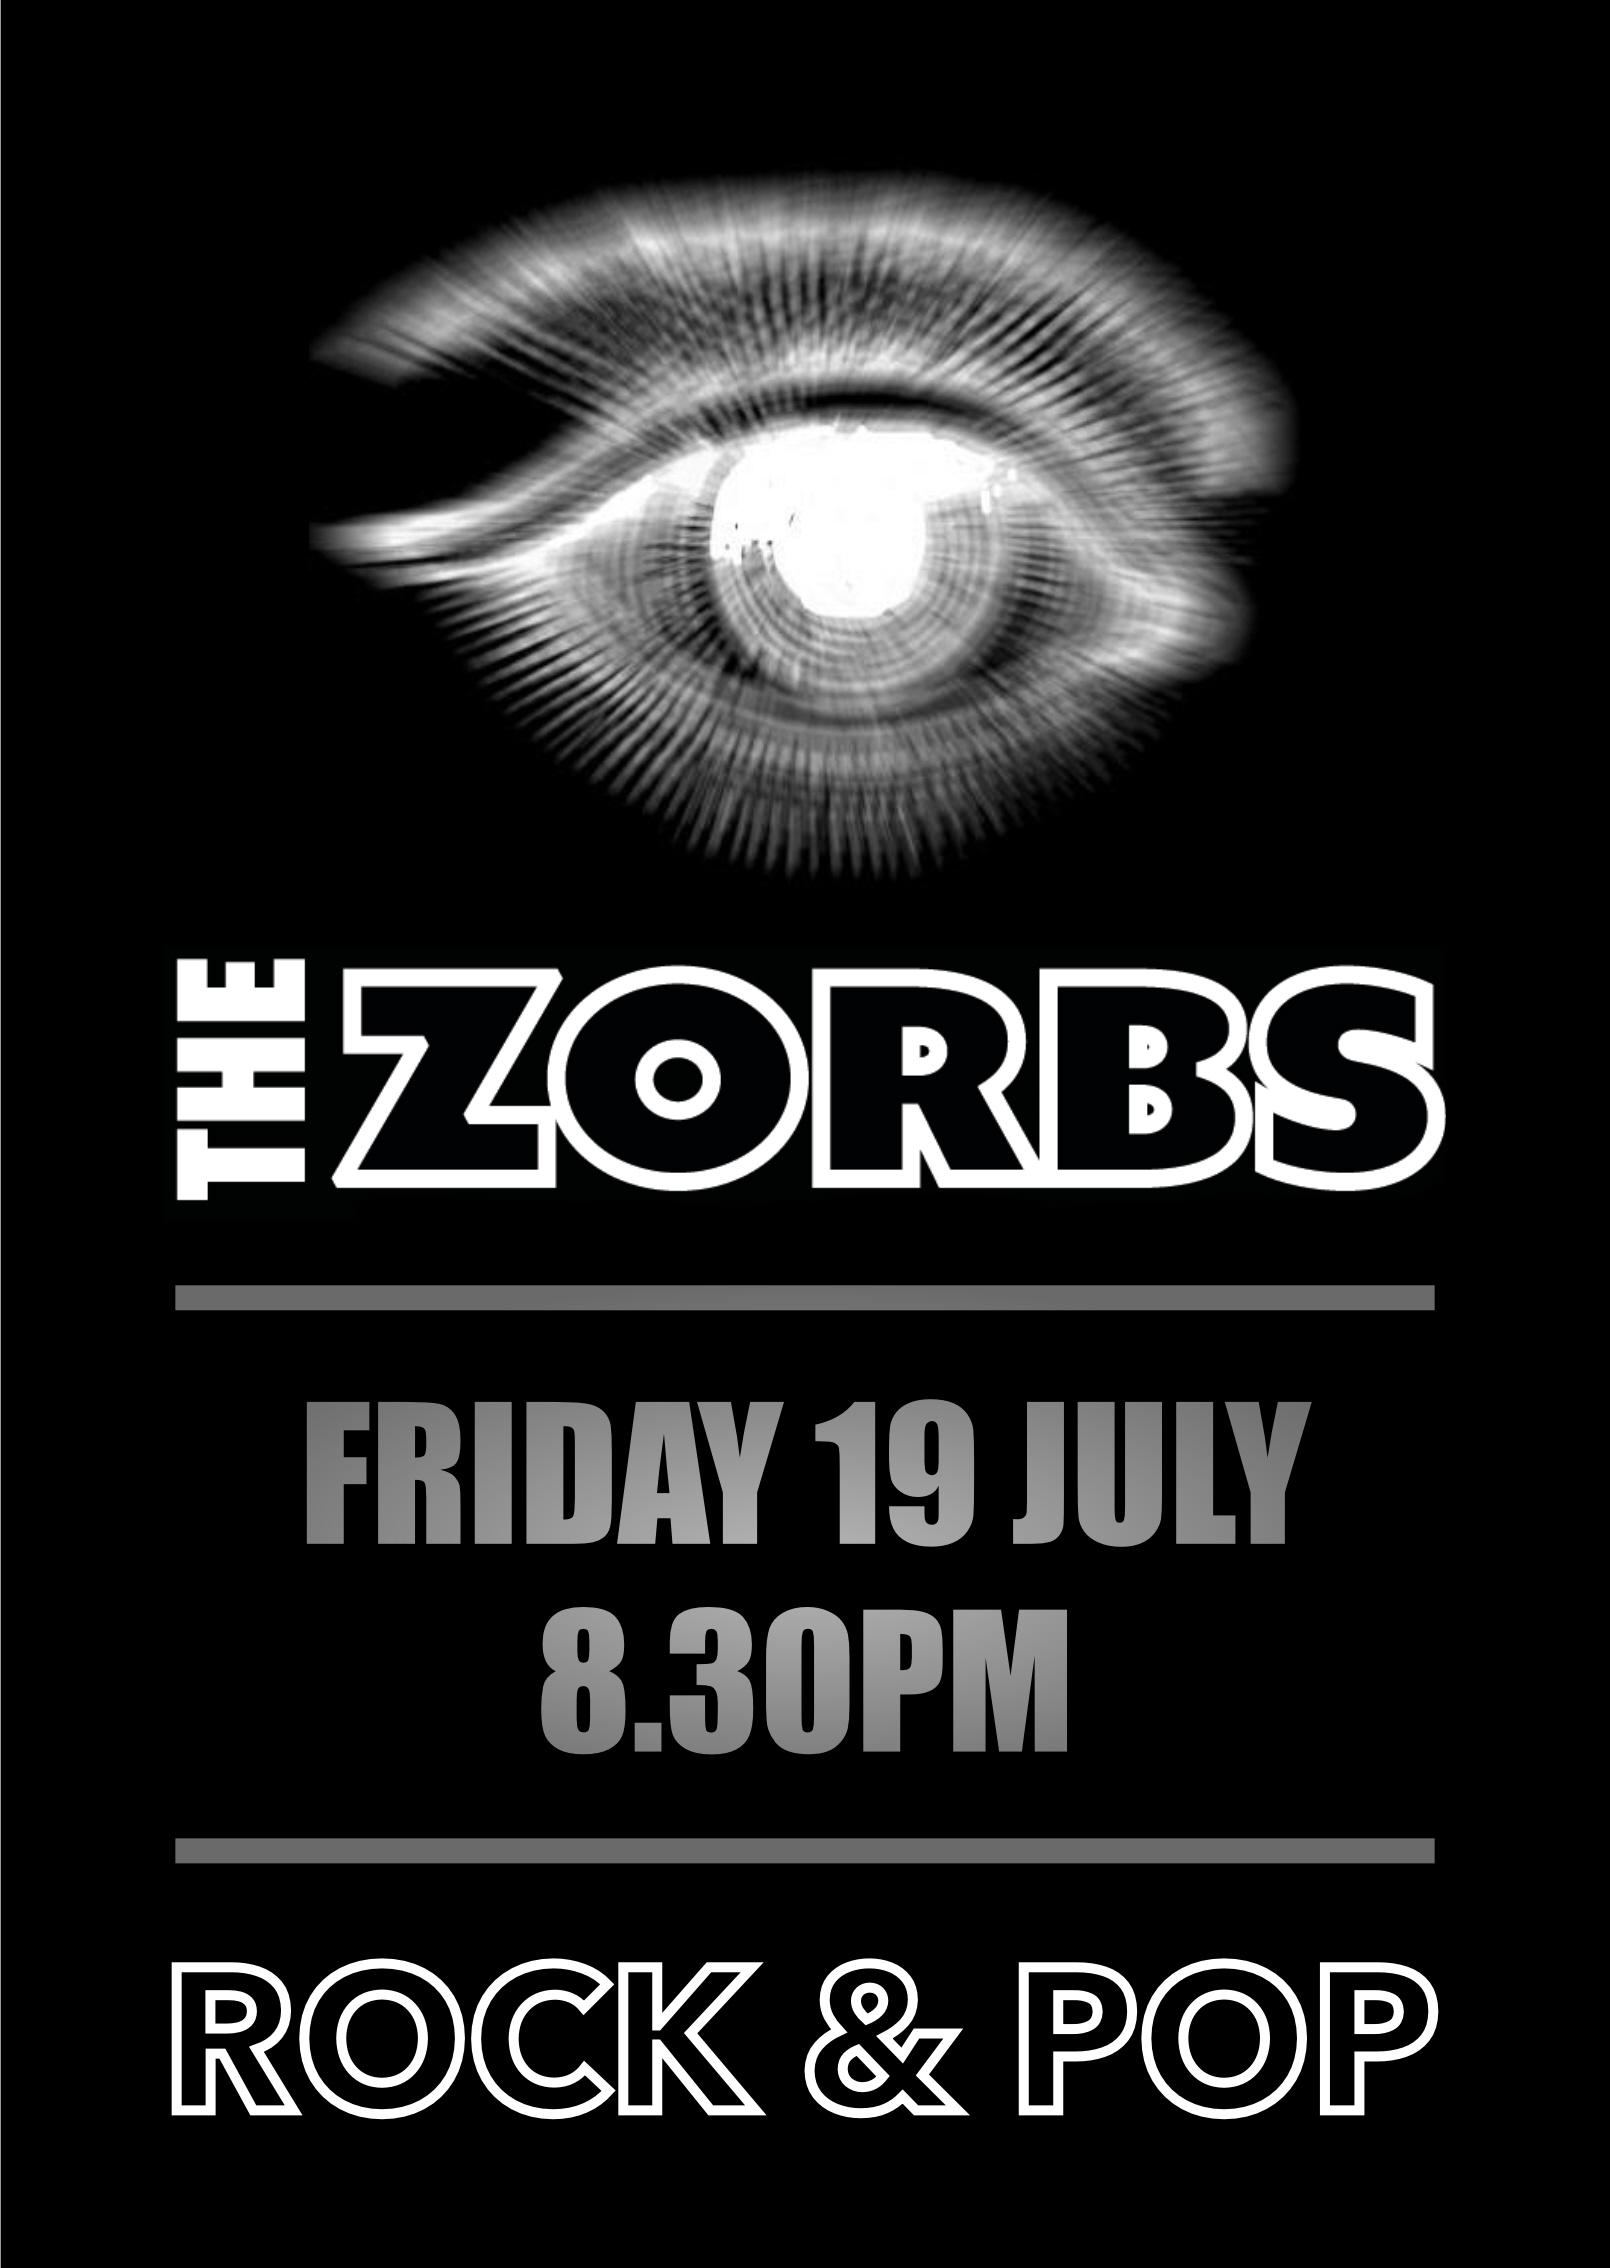 The Zorbs